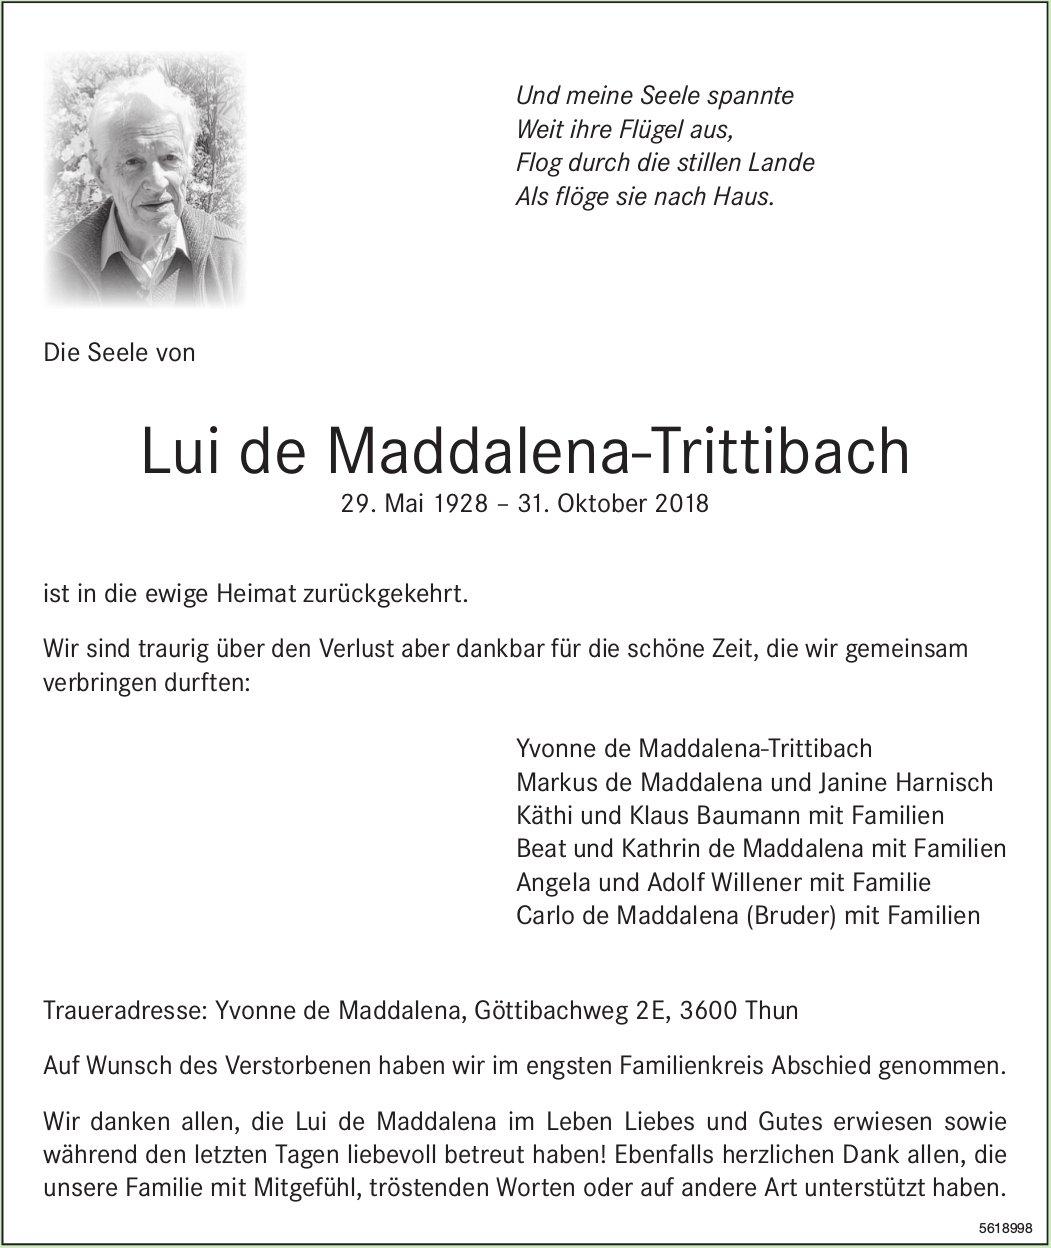 de Maddalena-Trittibach Lui, Oktober 2018 / TA